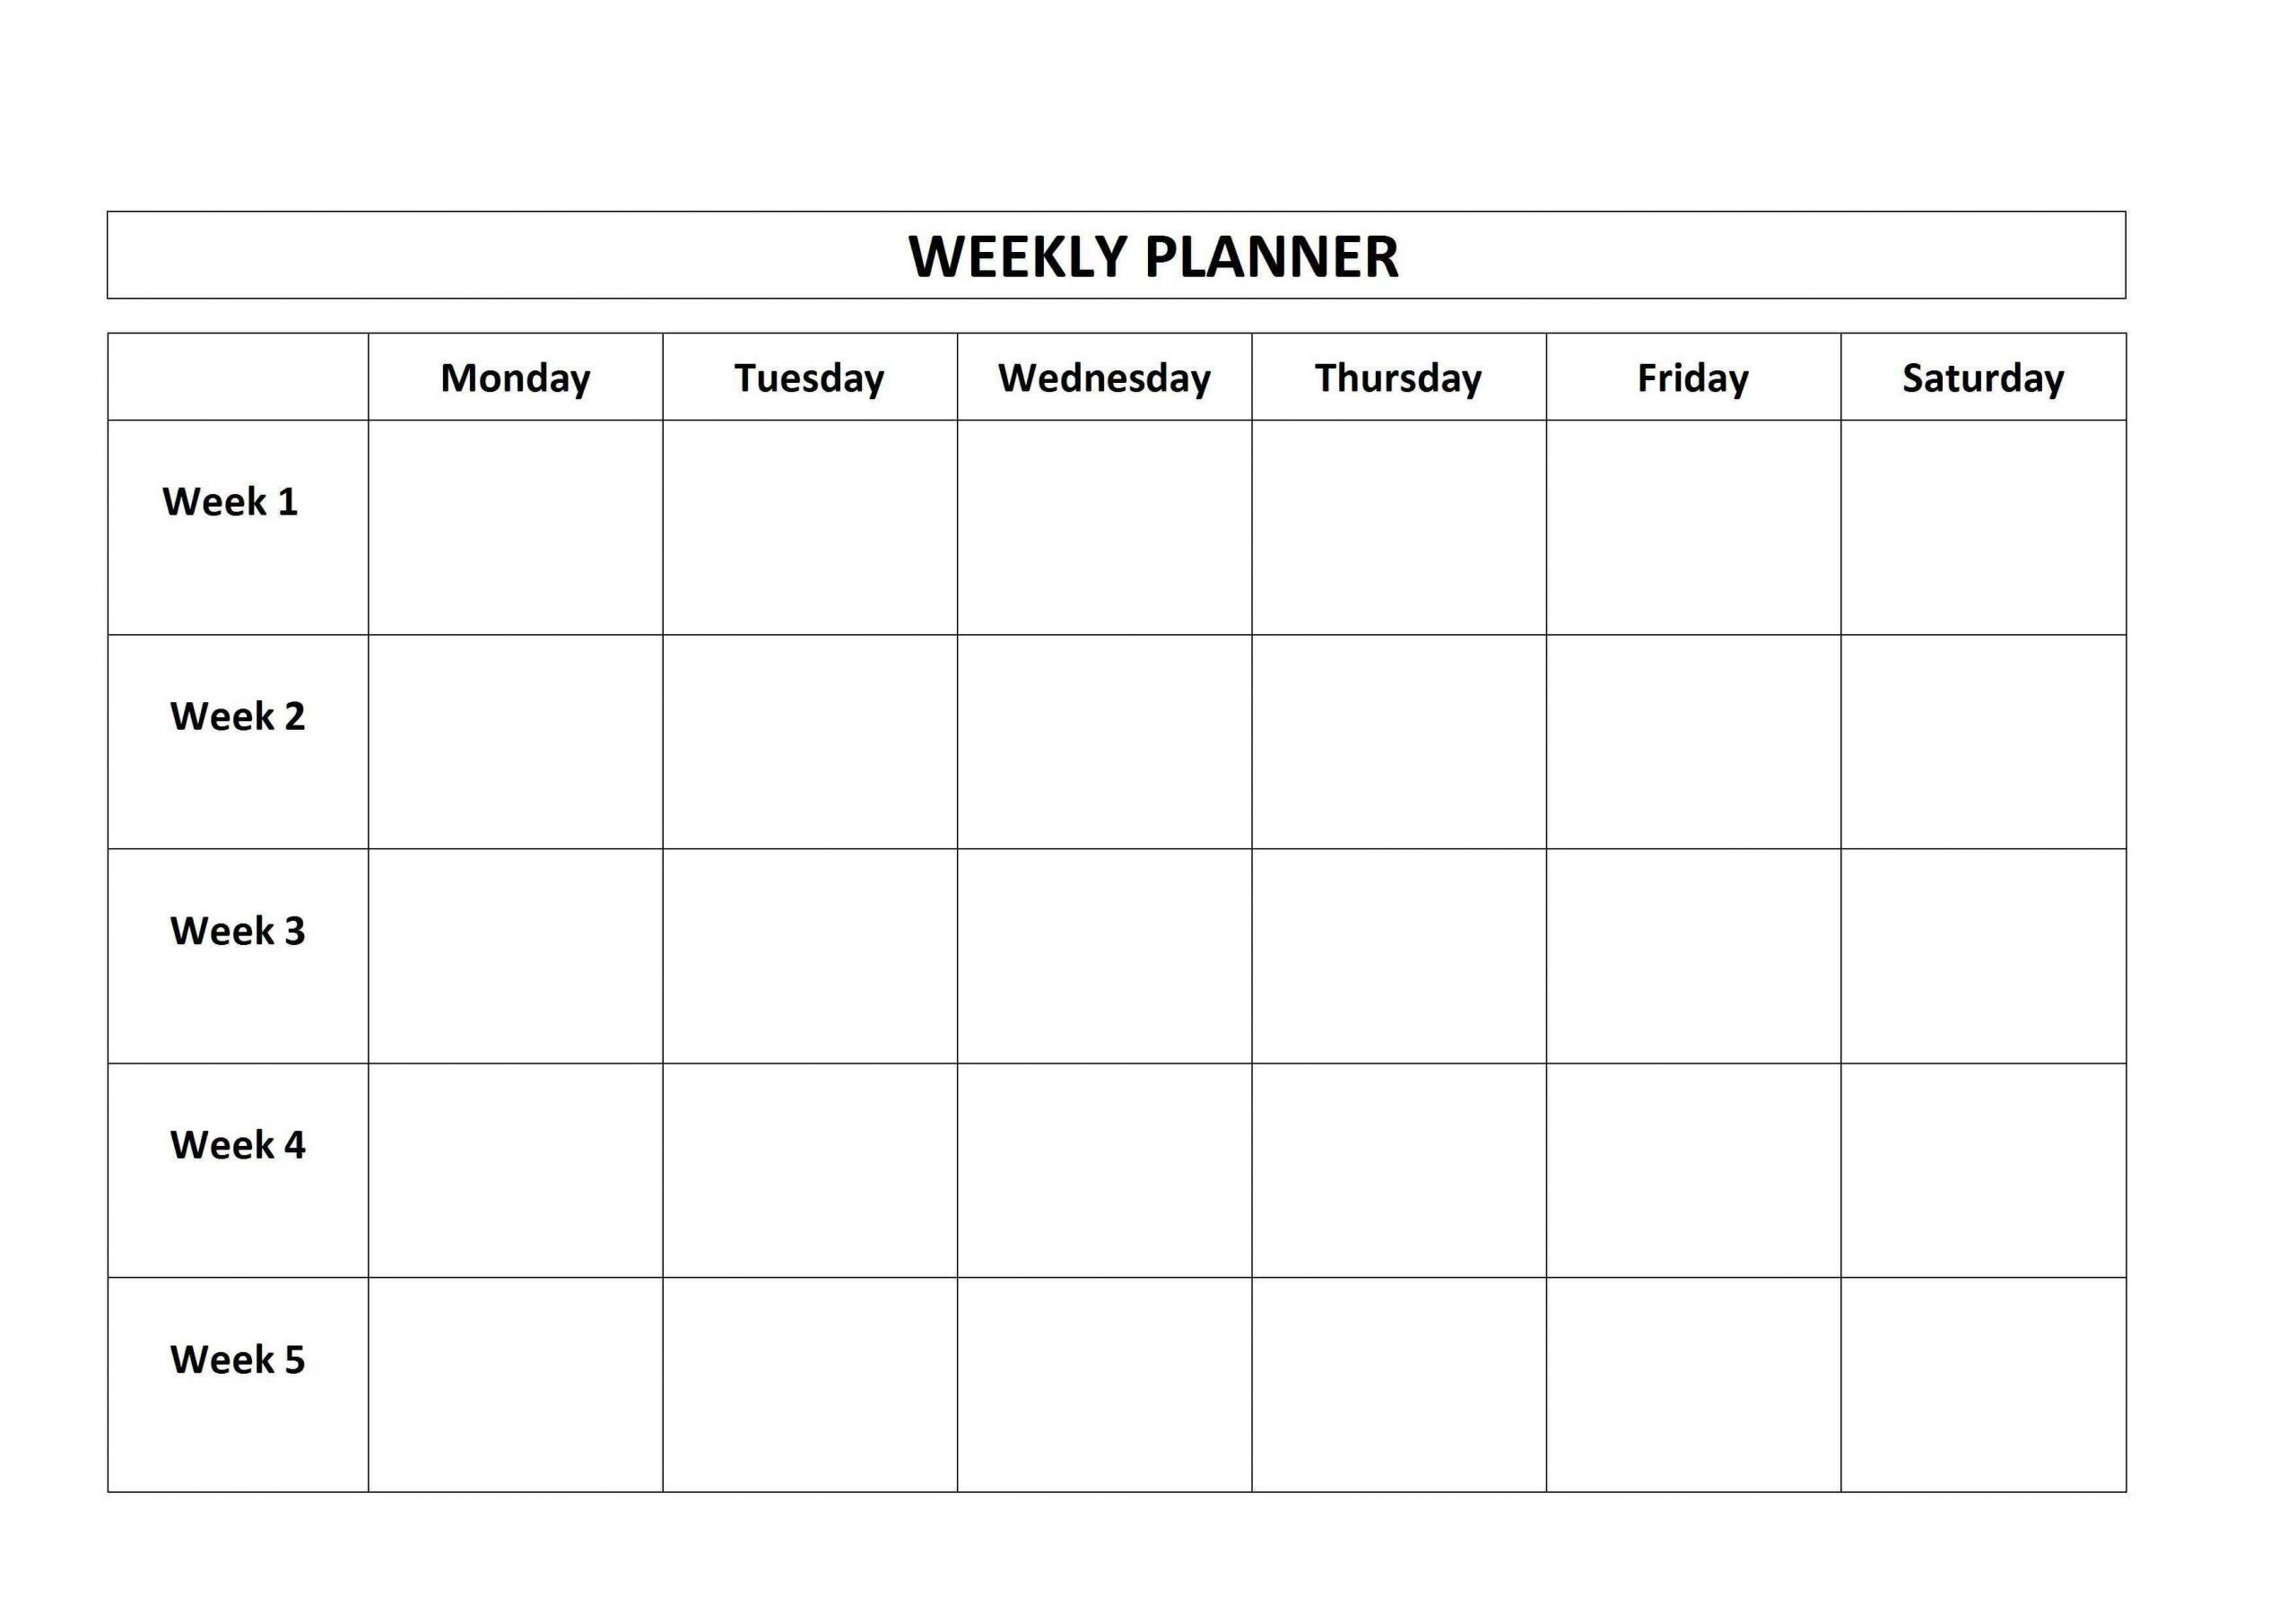 Mon – Friday Weekly Celendar : Free Calendar Template Free Monthly Printable Calendar Monday Through Friday